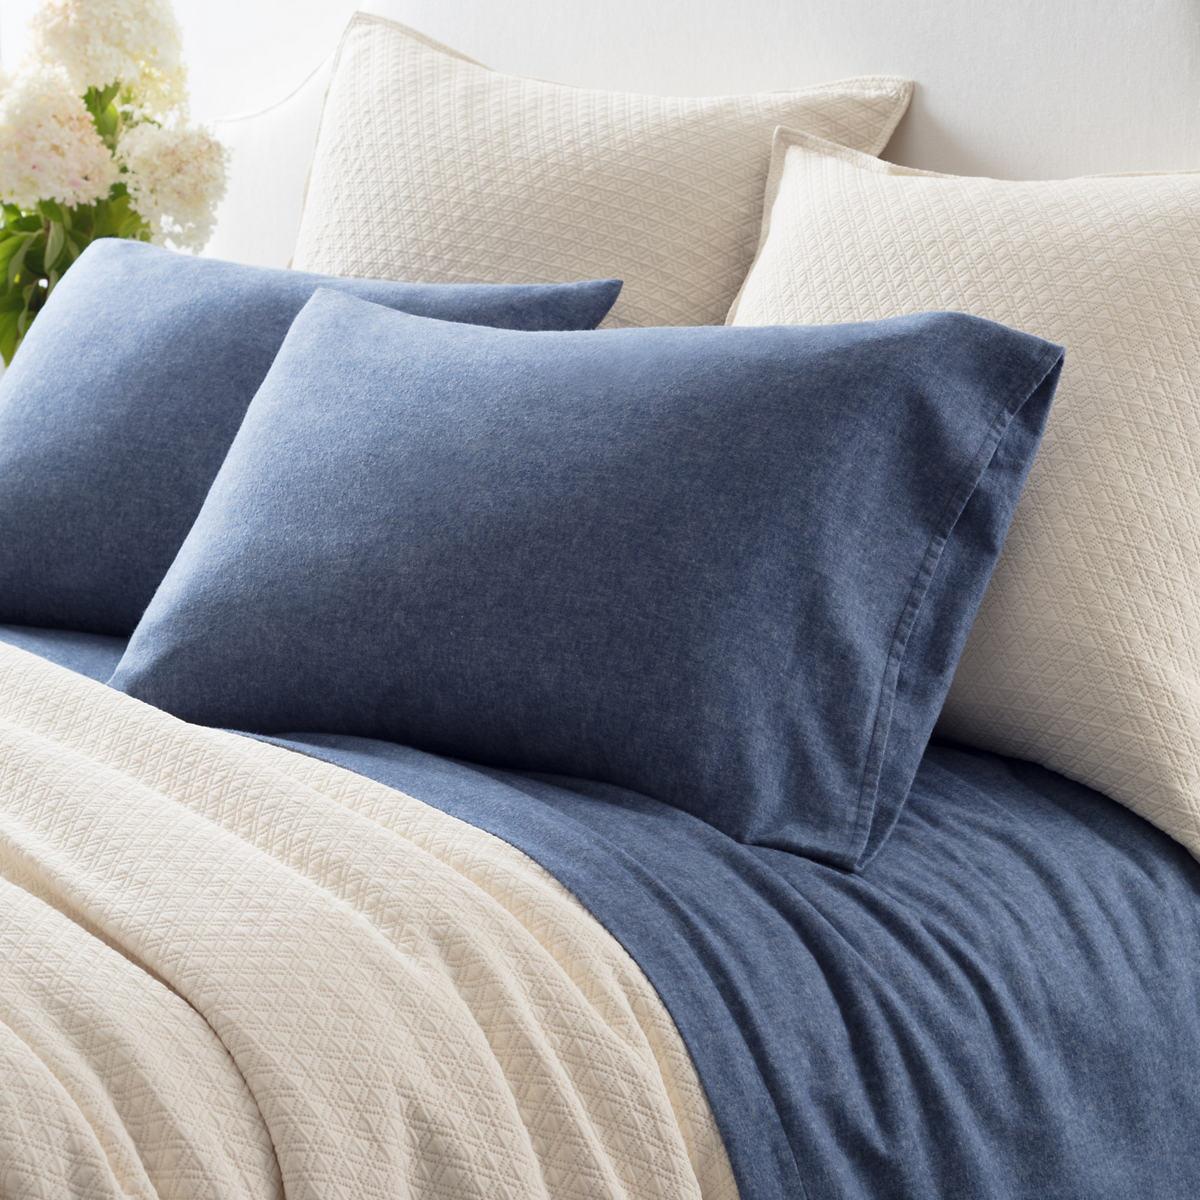 Chambray Flannel Blue Sheet Set